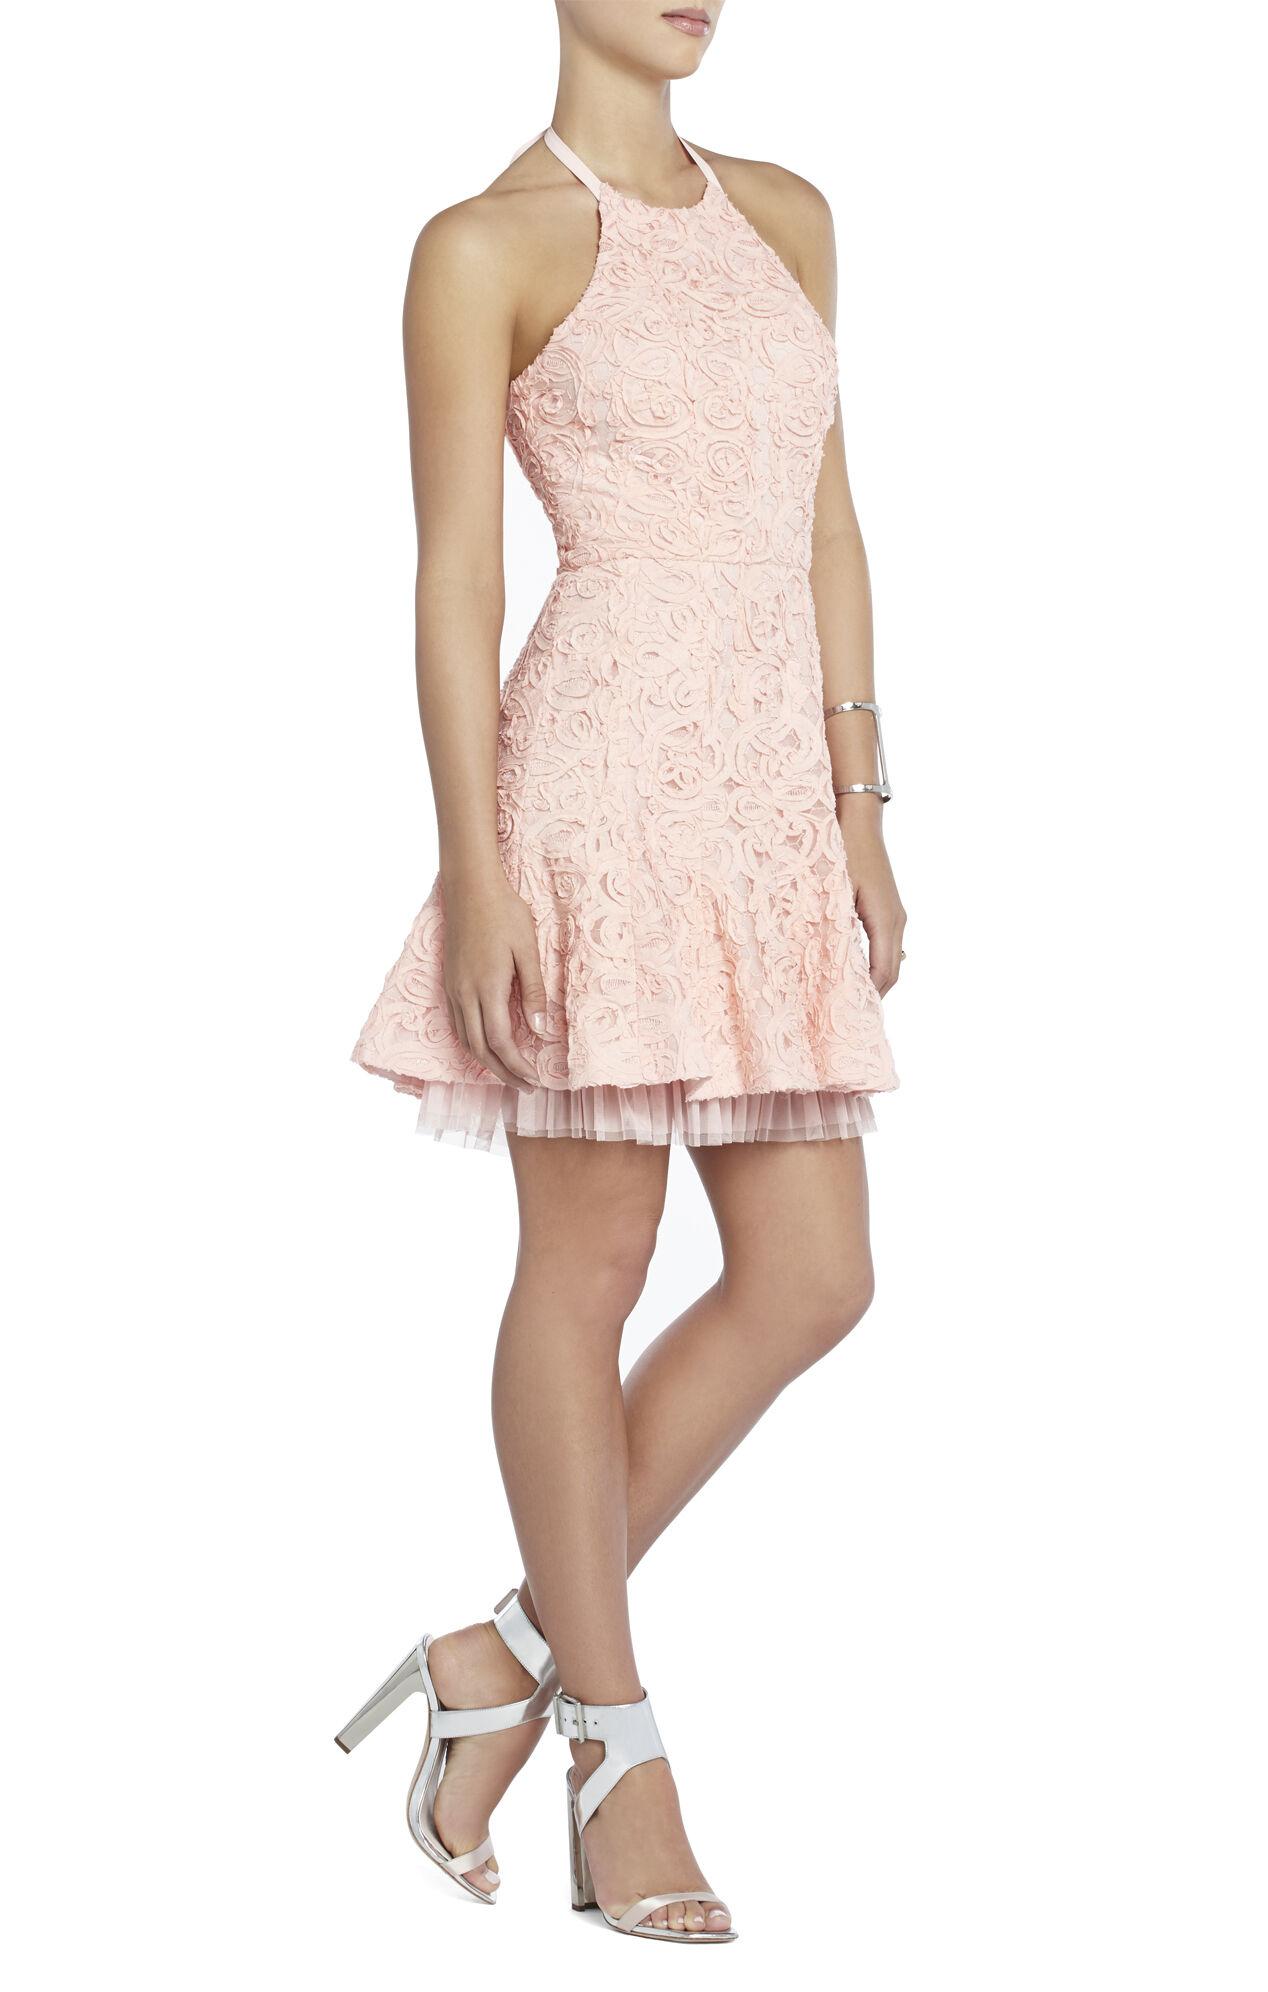 Pacer Open-Toe High-Heel Dress Sandal